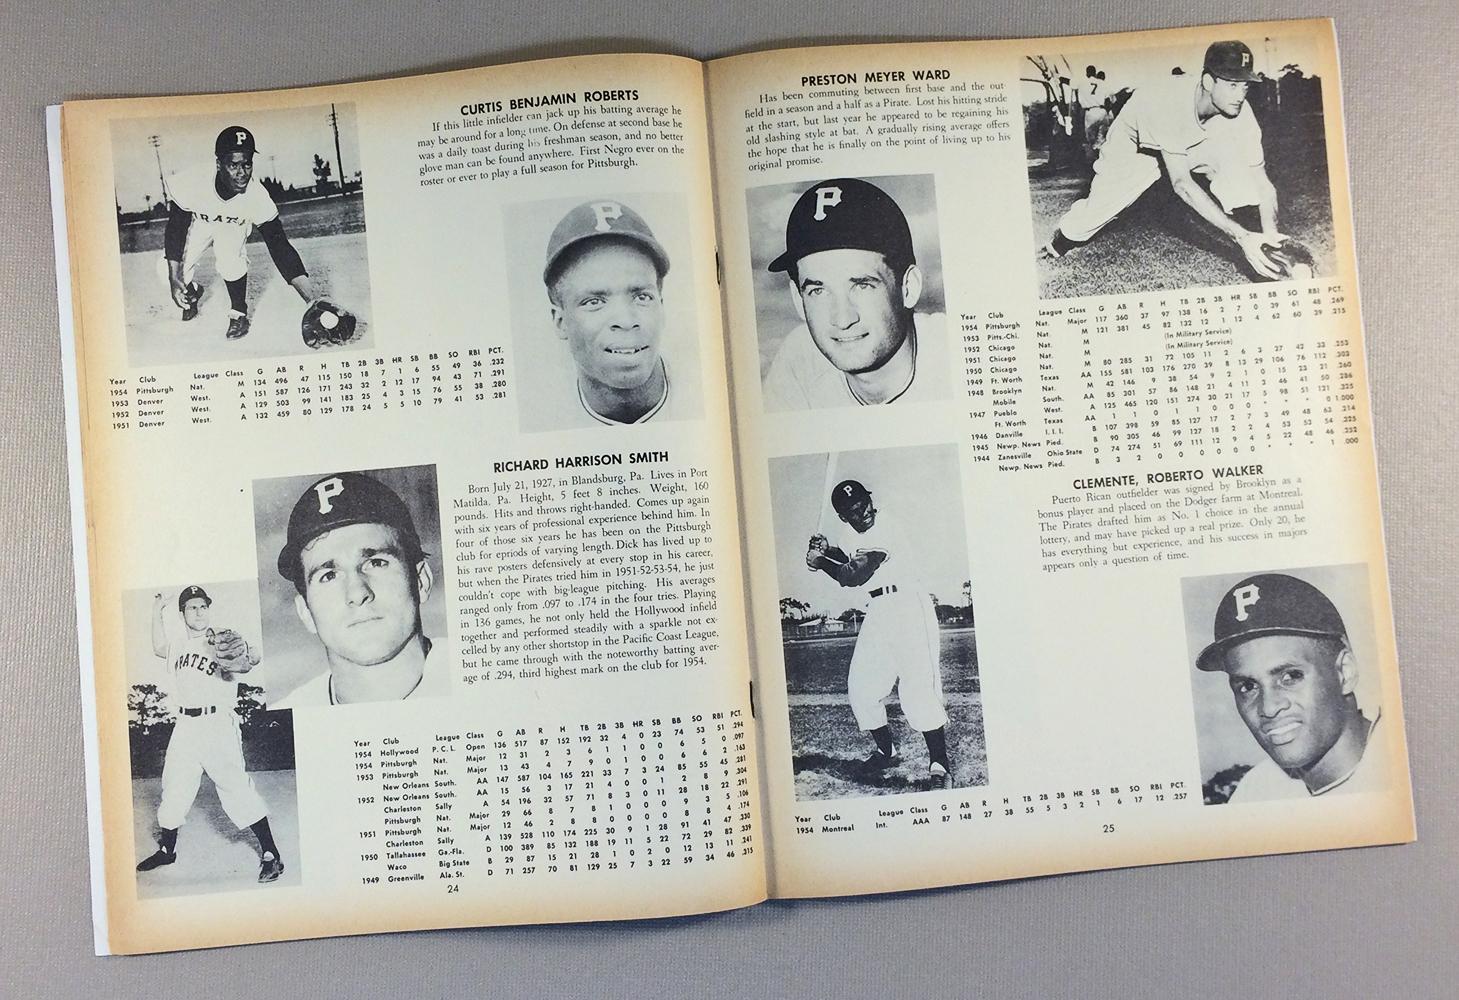 baseball_mlb_pirates_1955_yearbook_A.jpg